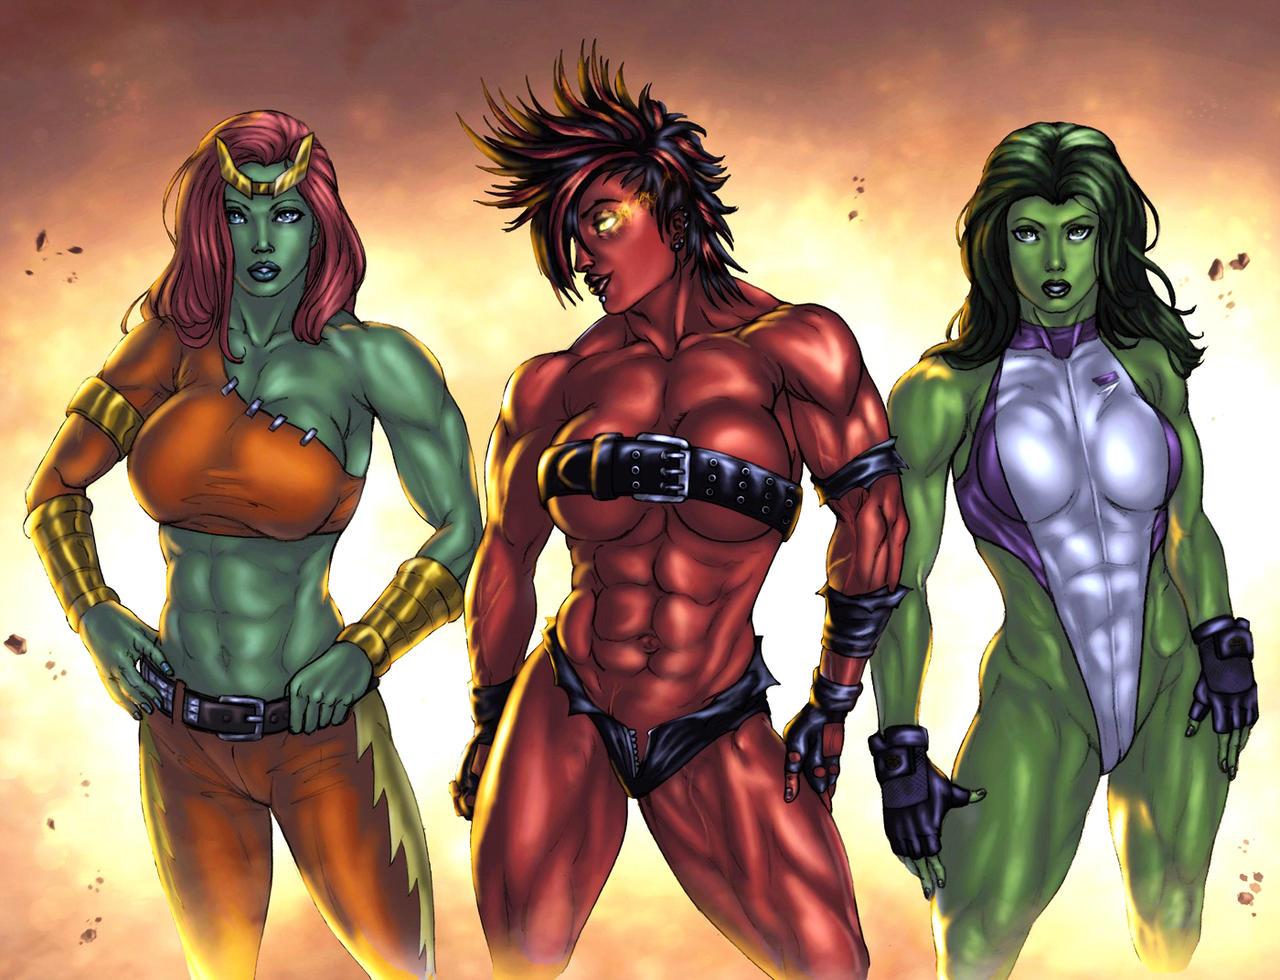 She-Hulk on Muscle Beach by JoeJusko on DeviantArt